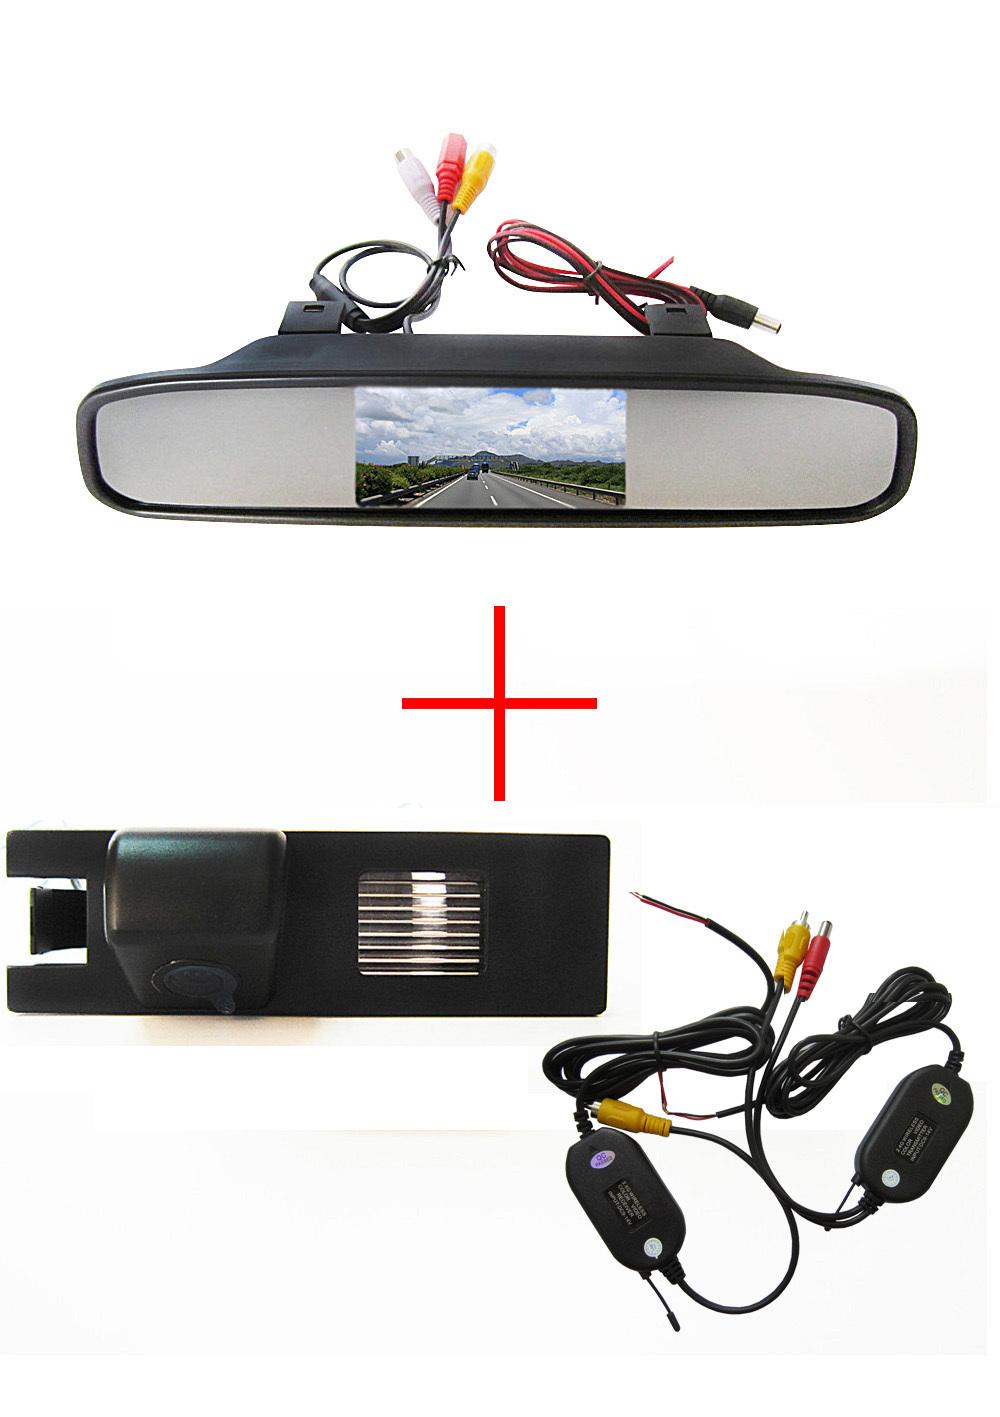 Wireless Car Rear View Camera for OPEL Astra H/Corsa D/Meriva A/Vectra C/Zafira B,FIAT Grande+4.3Inch rearview Mirror Monitor(China (Mainland))